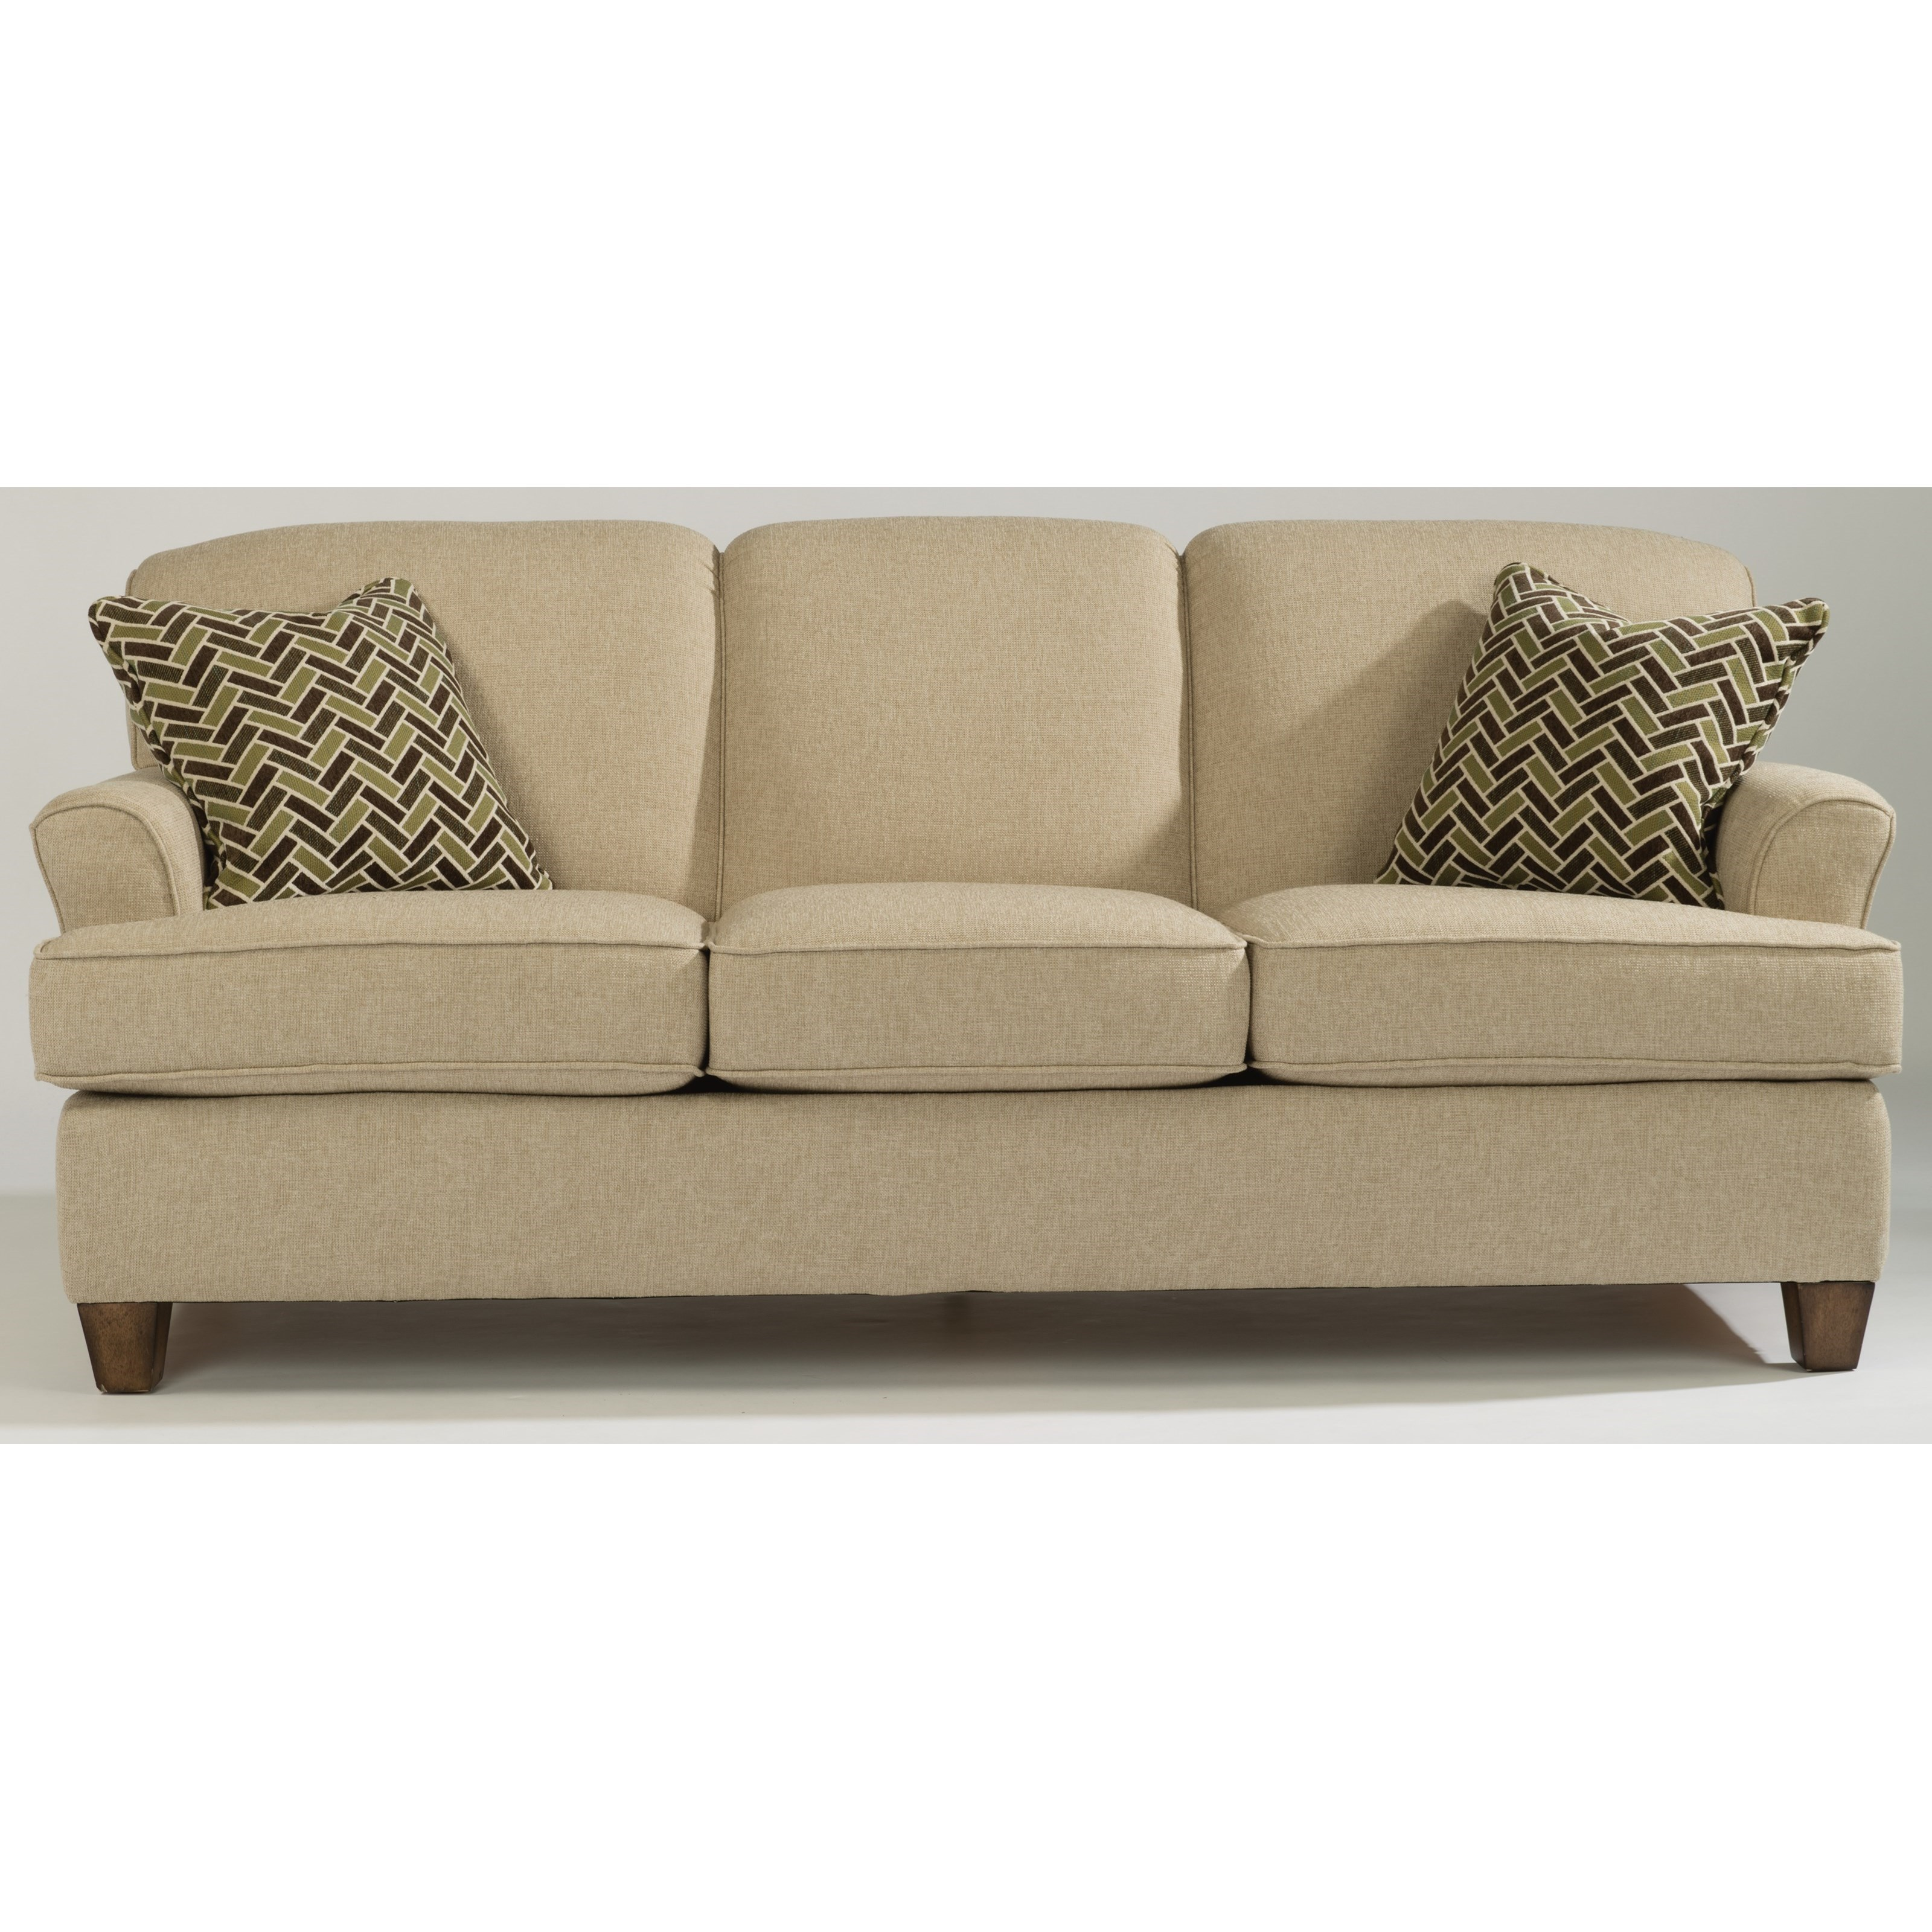 Atlantis Sofa by Flexsteel at Williams & Kay